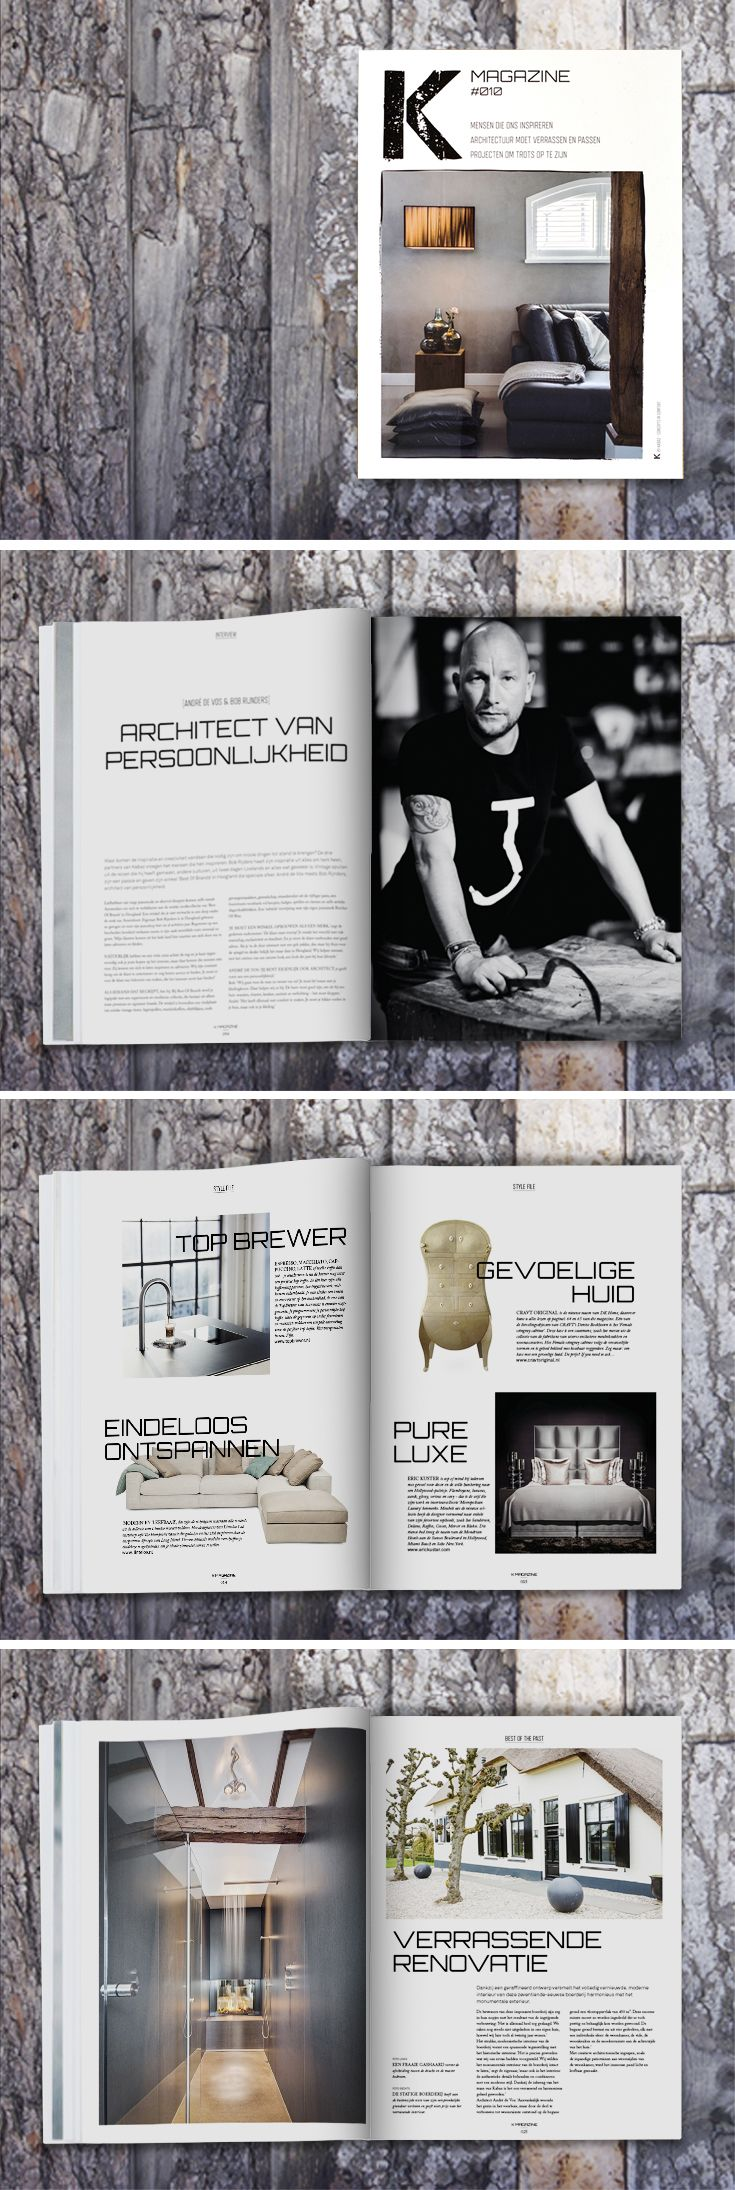 K-magazine, ontwerp lay-out en vormgeving #Magazine #Kabaz